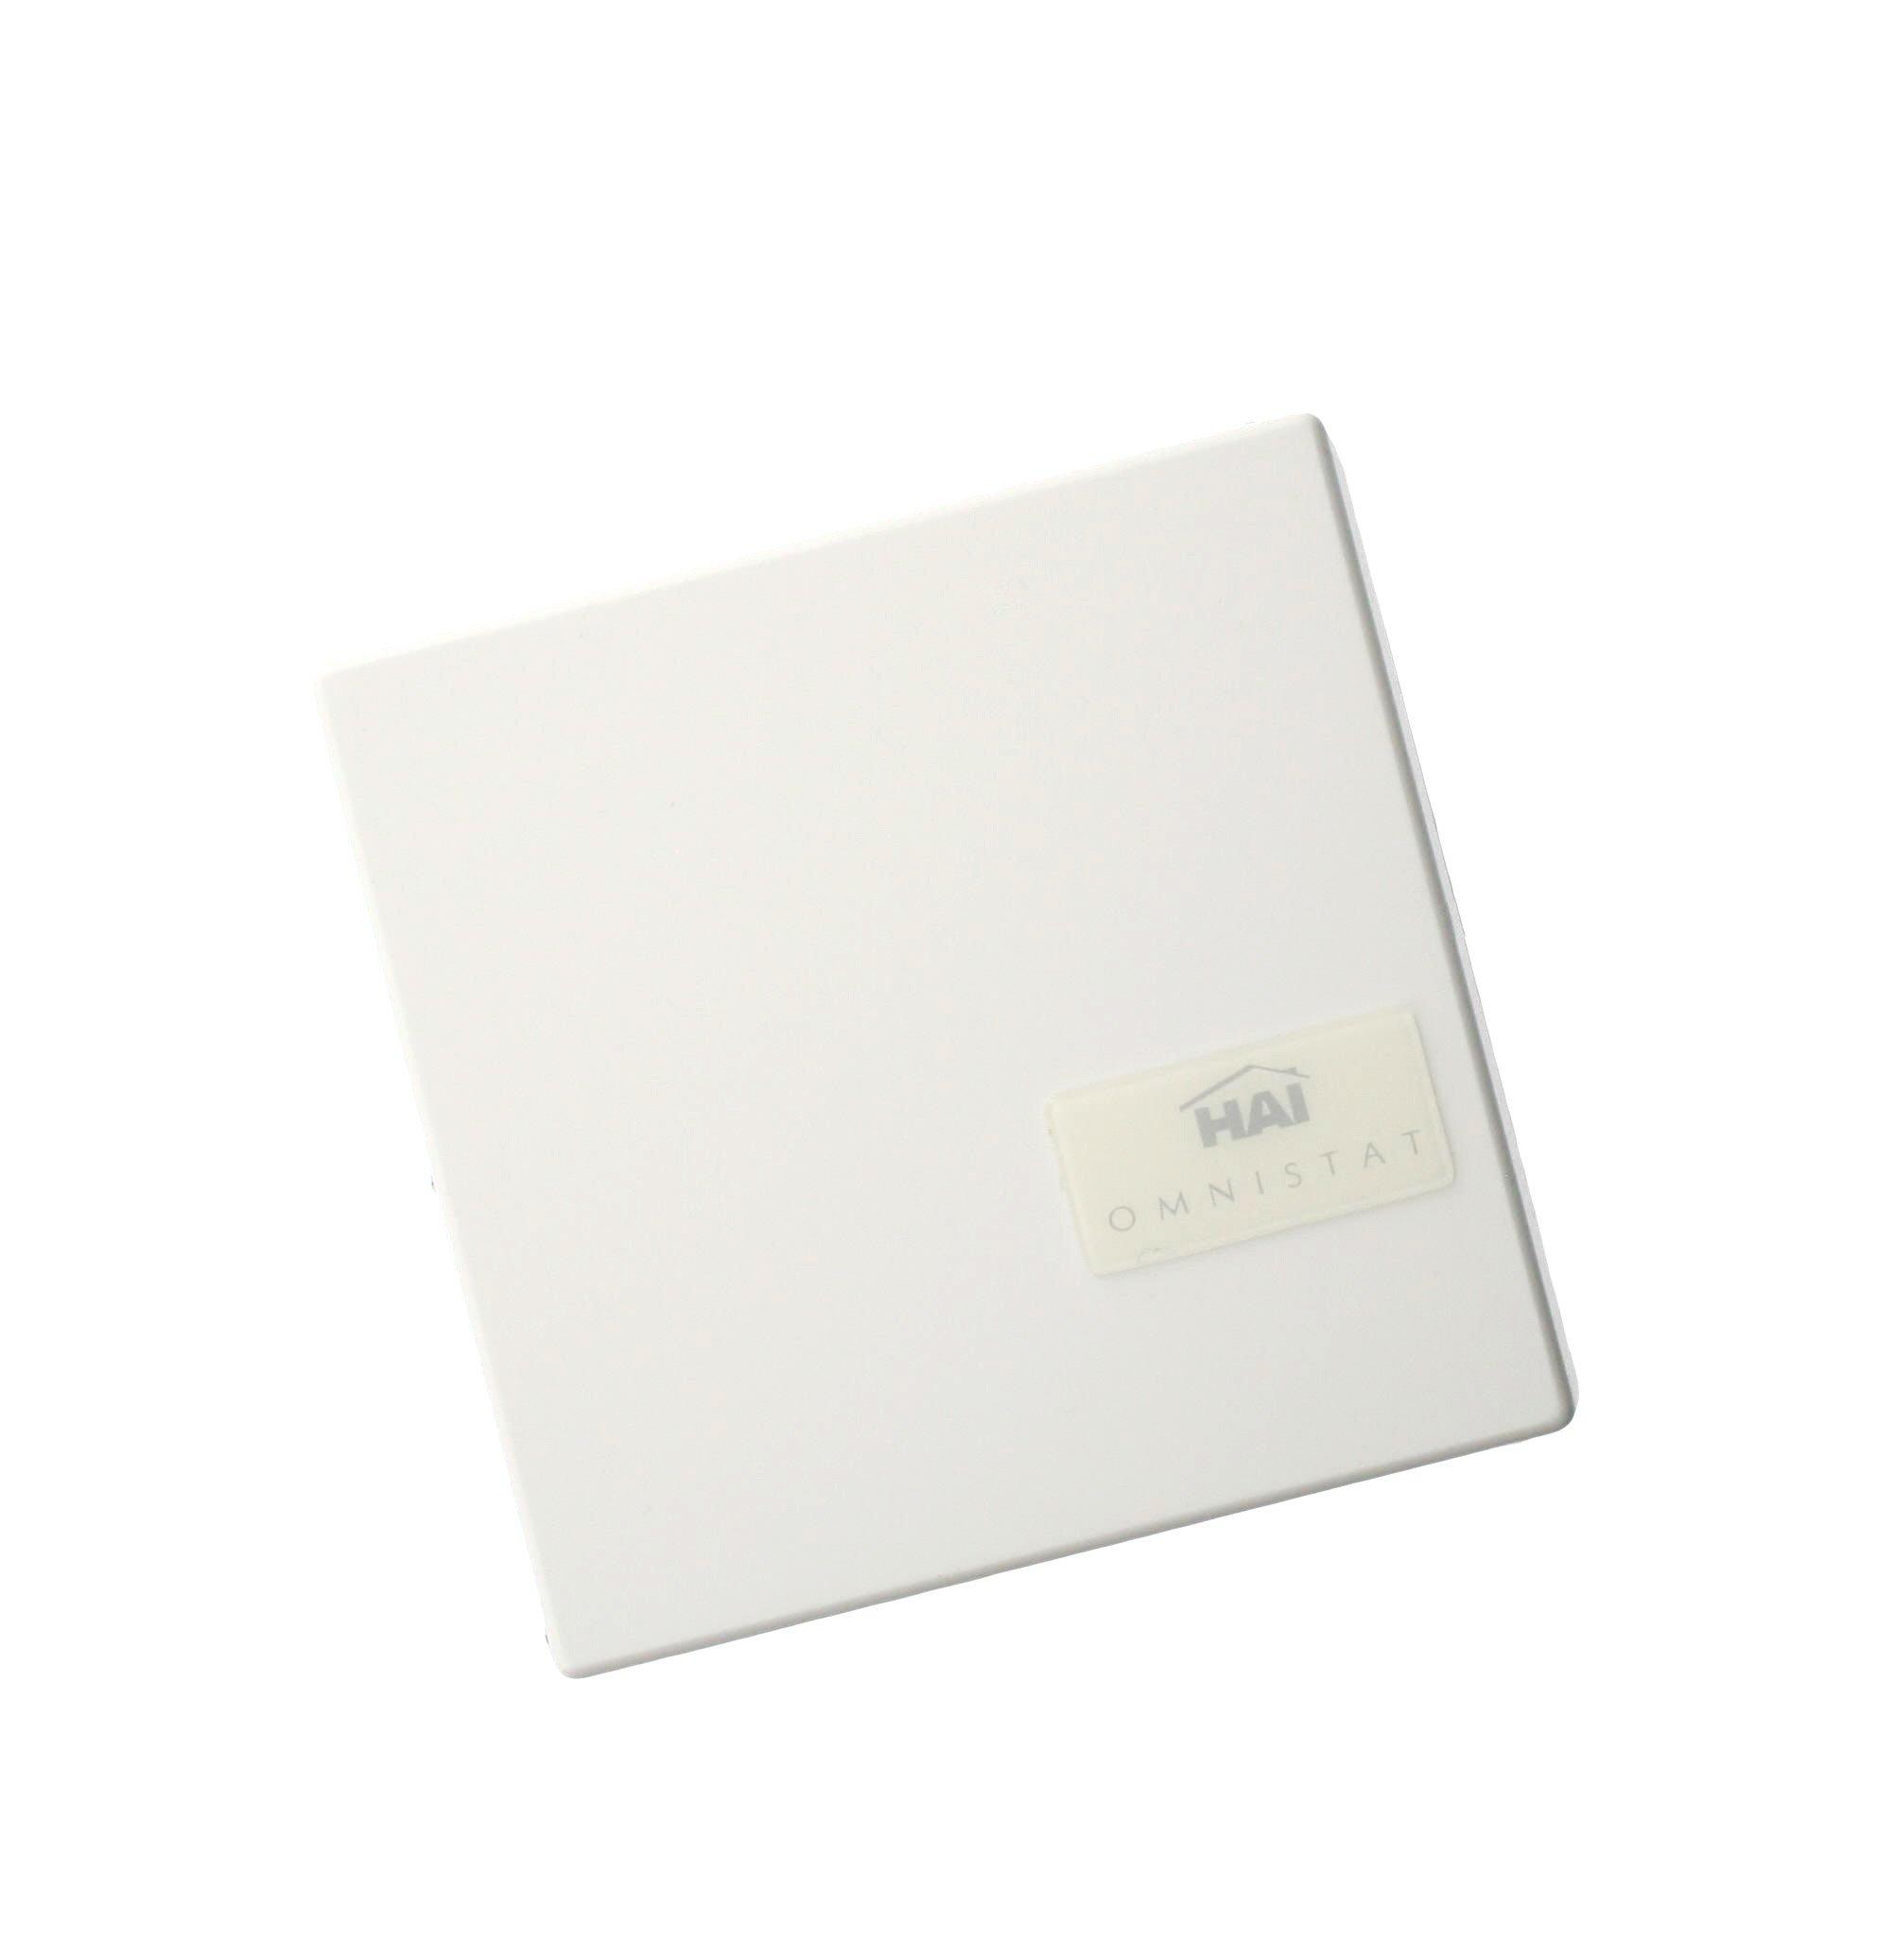 Leviton 31A00-8 Extended Range Indoor/Outdoor Temp Sensor & Humidity Sensor